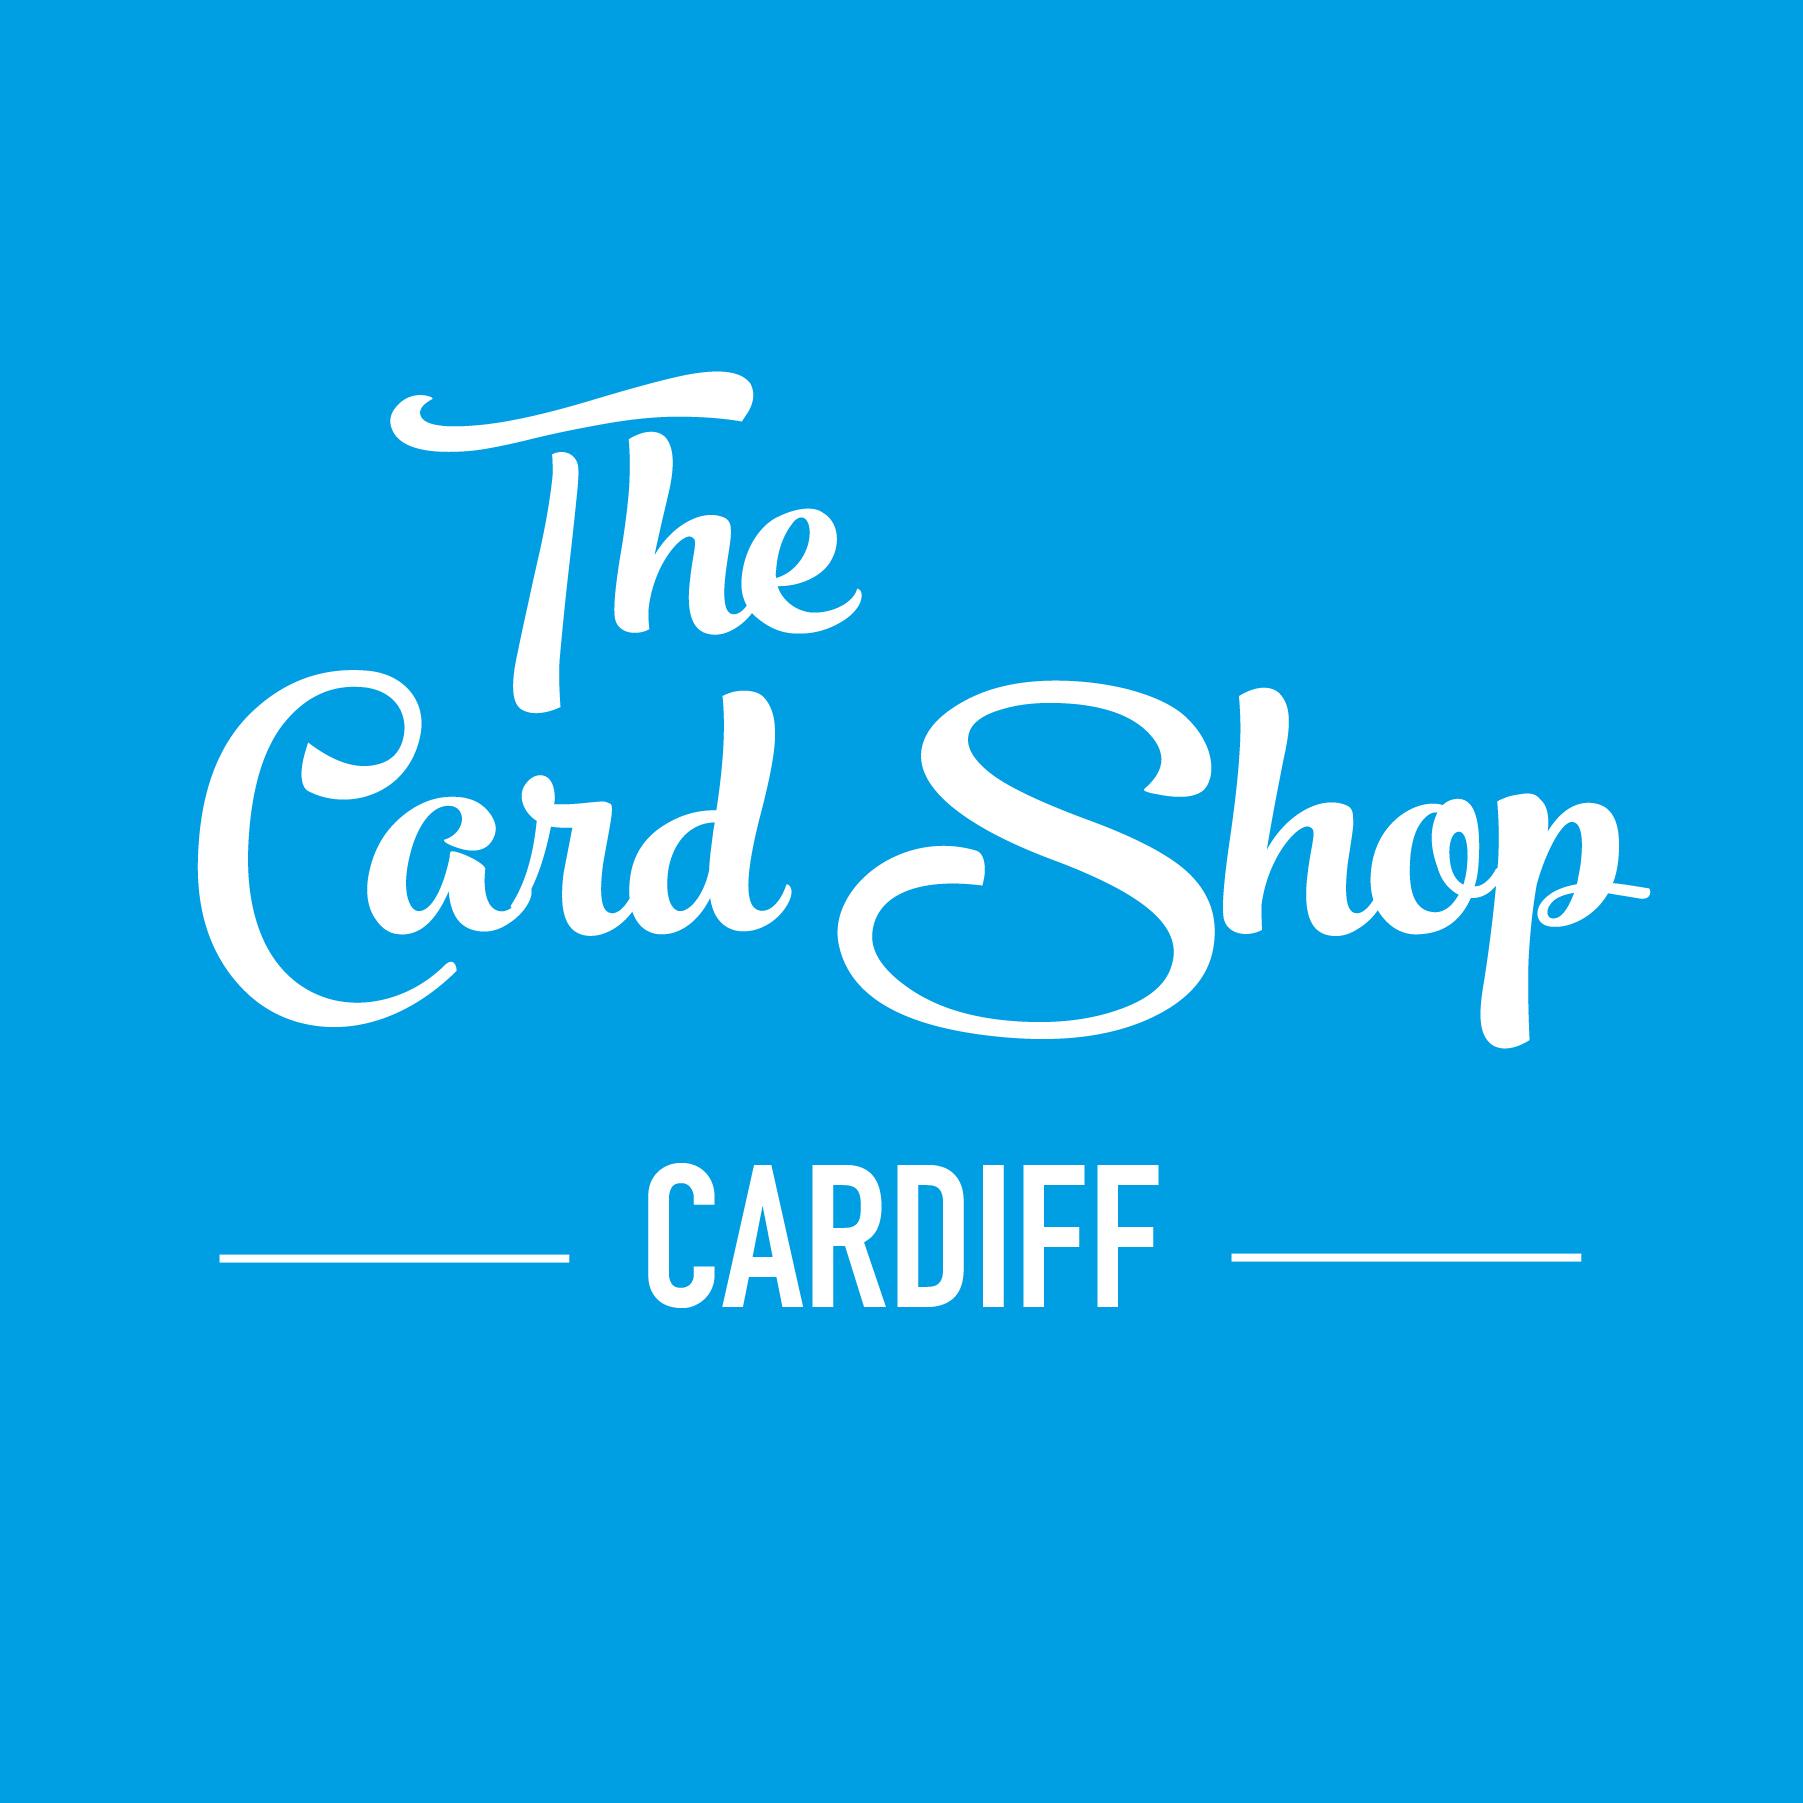 Card Shop Cardiff